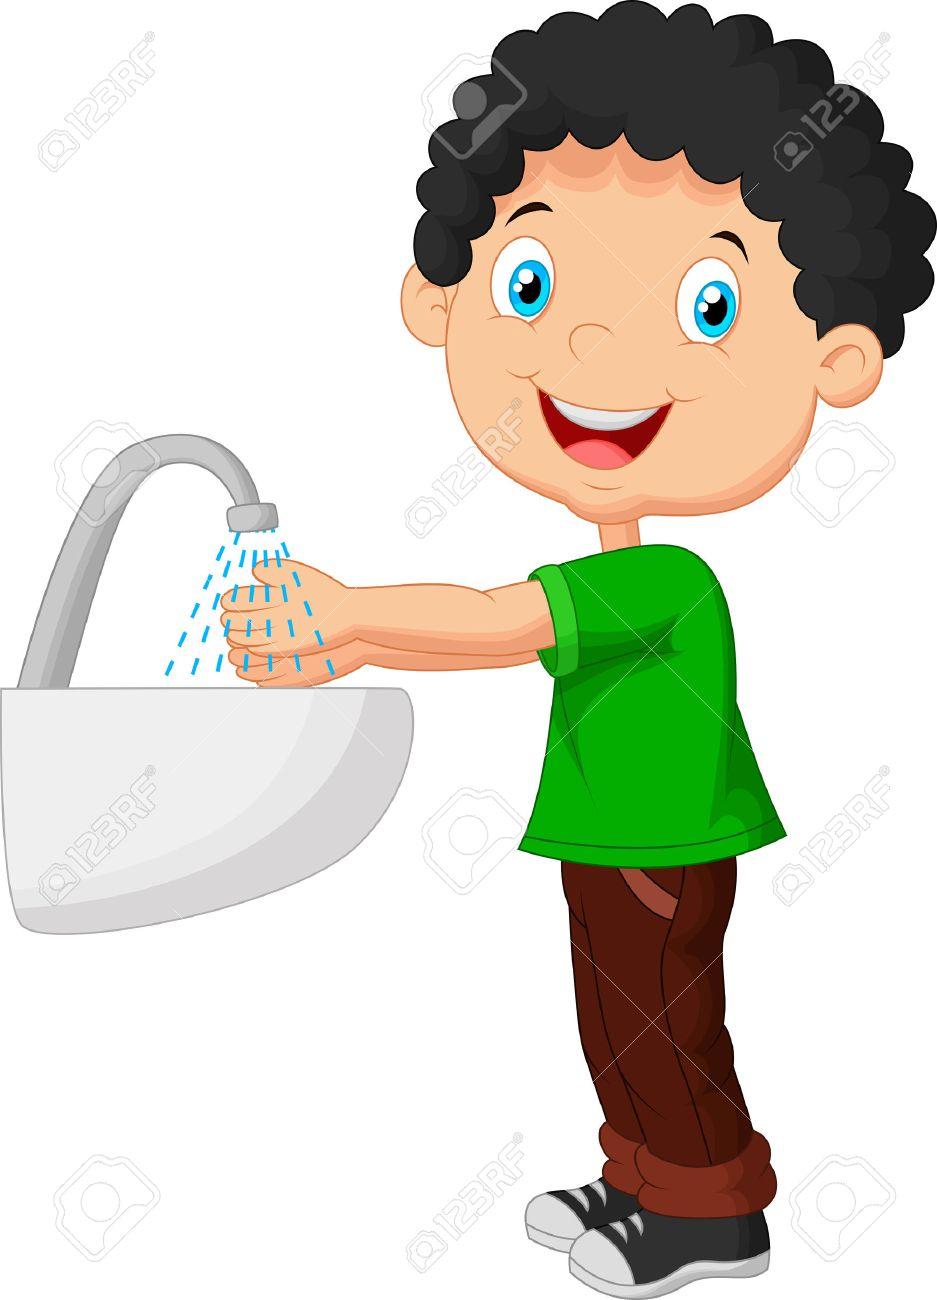 Cute cartoon boy washing his hands.